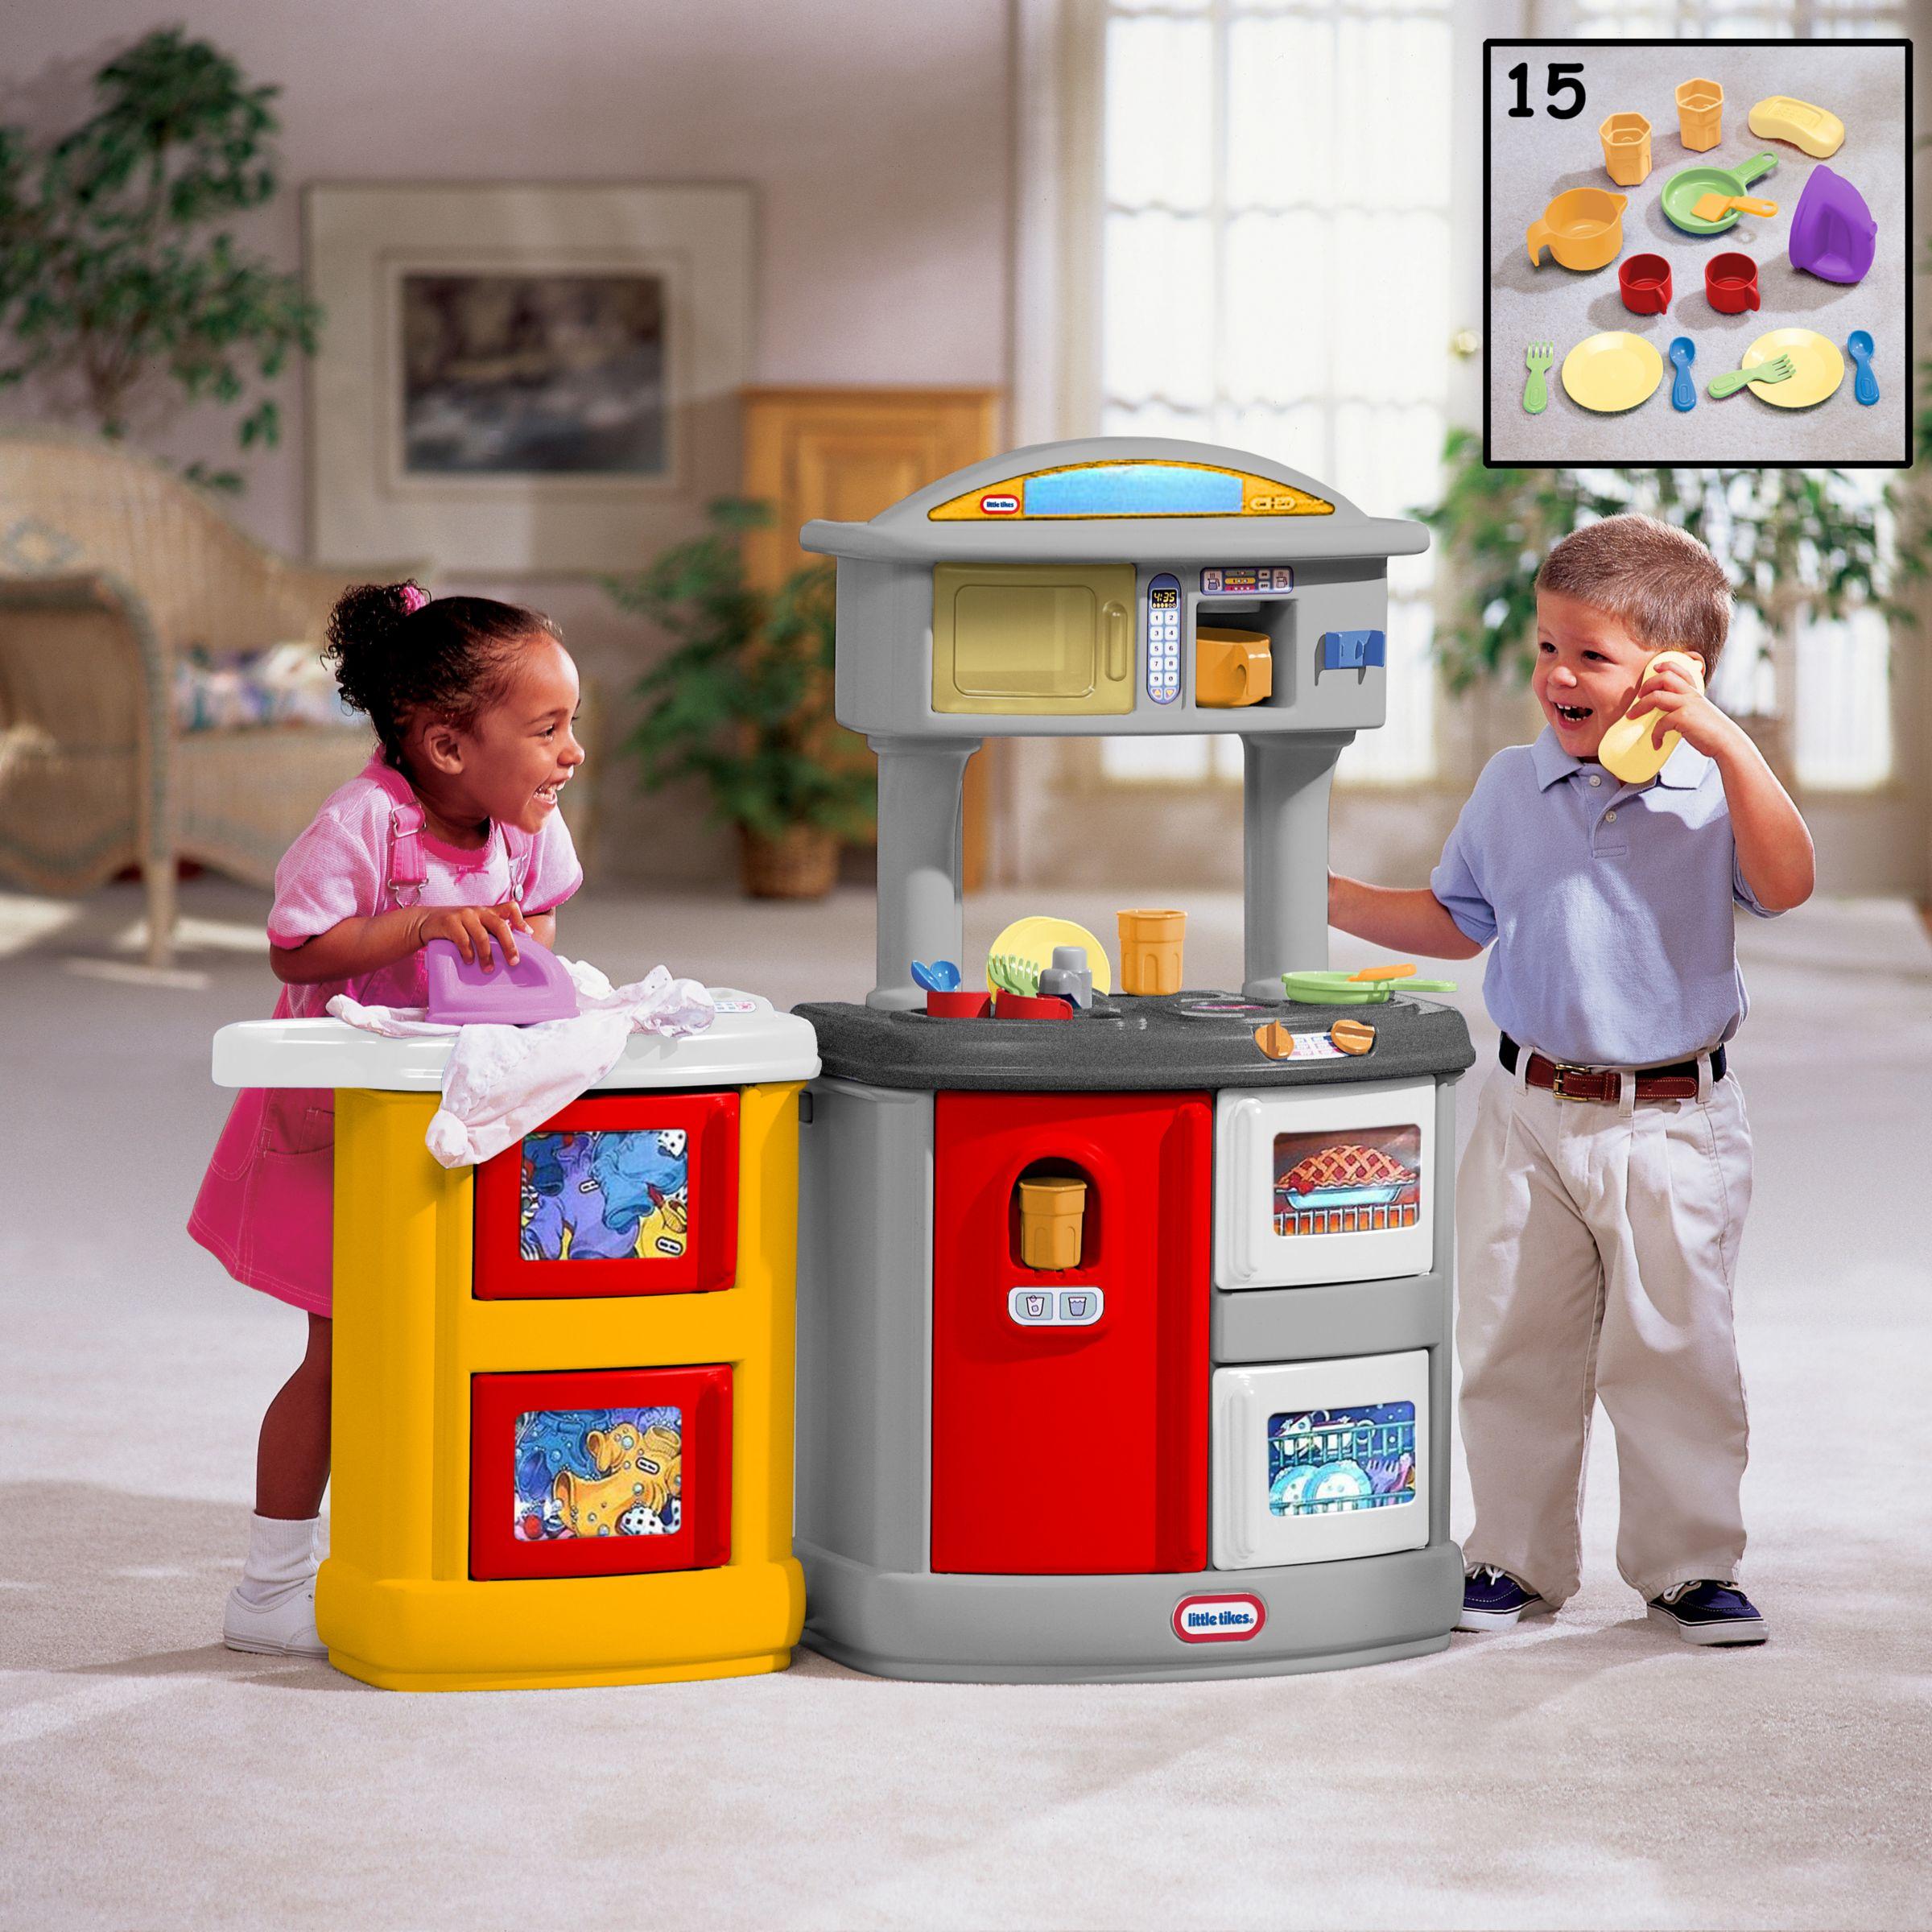 Фото куни с игрушками 21 фотография